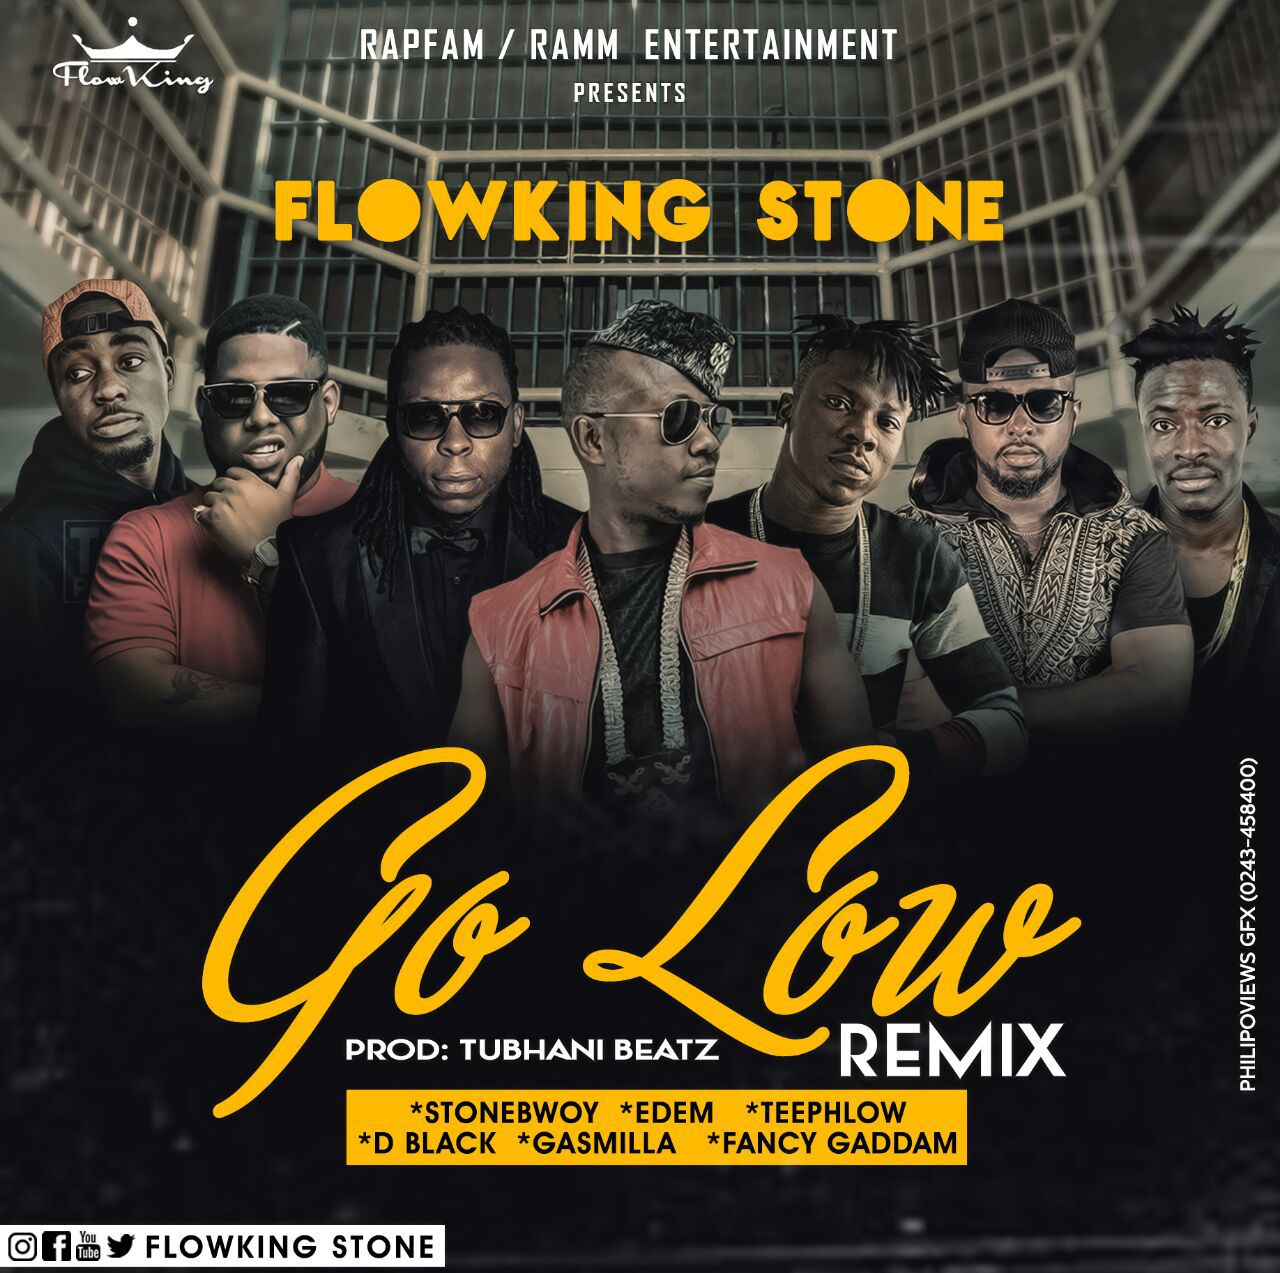 Flowking Stone – Go Low Remix ft Stonebwoy, Edem, D Black, Teephlow, Gasmilla, Fancy Gadam